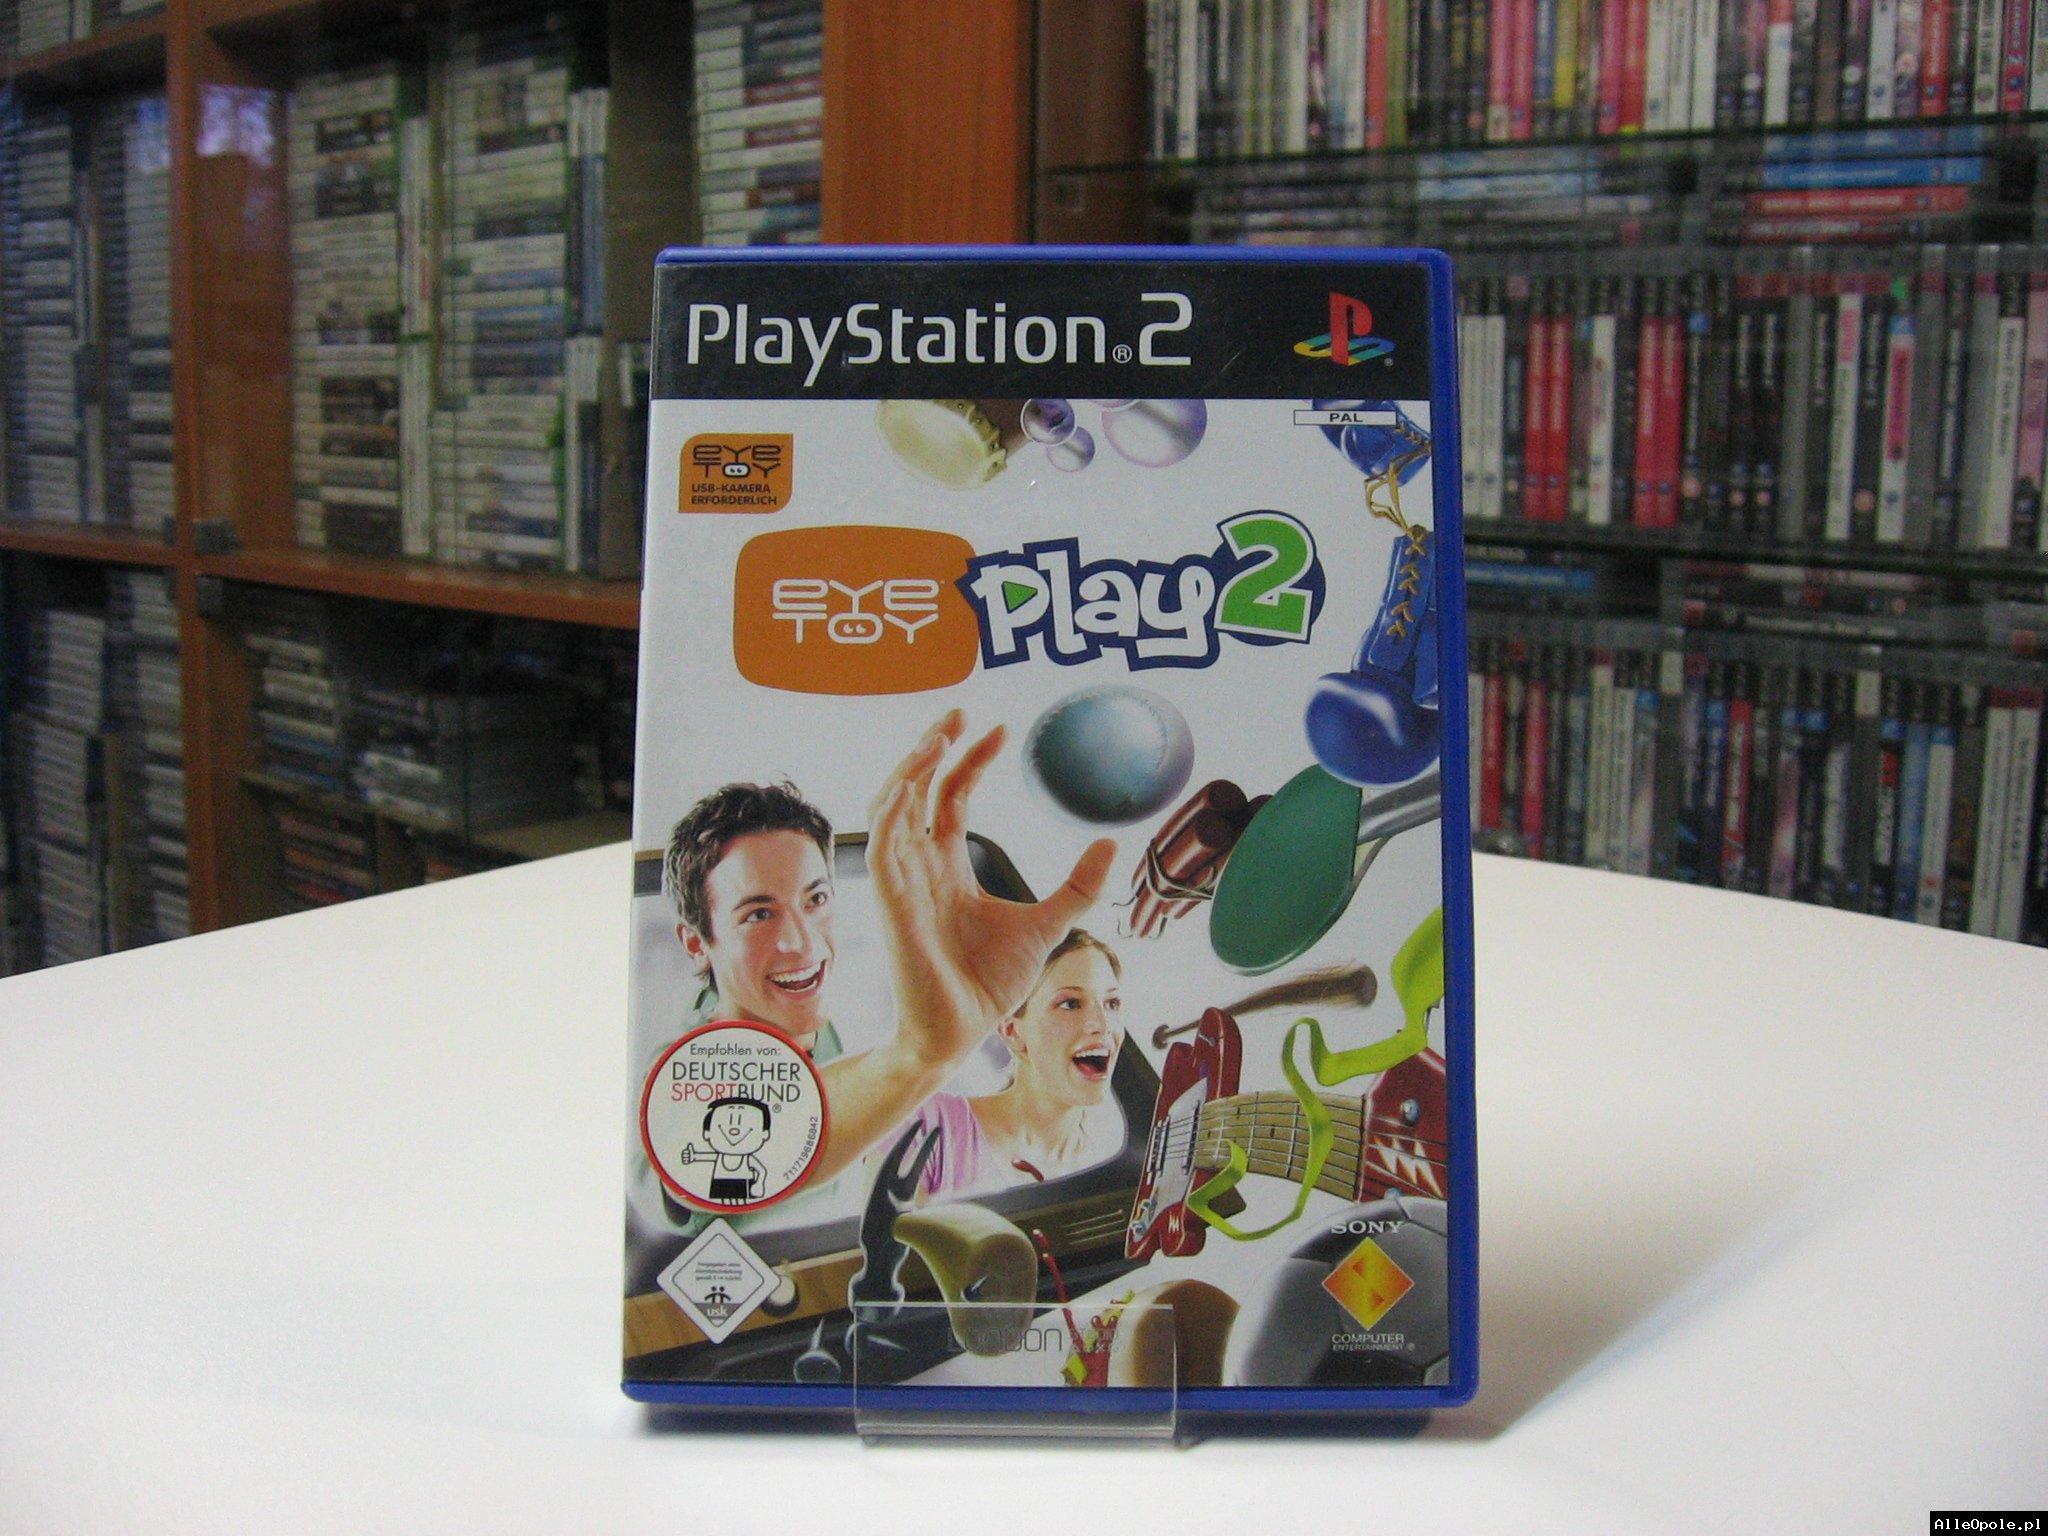 EyeToy: Play 2 - GRA Ps2 - Opole 0570